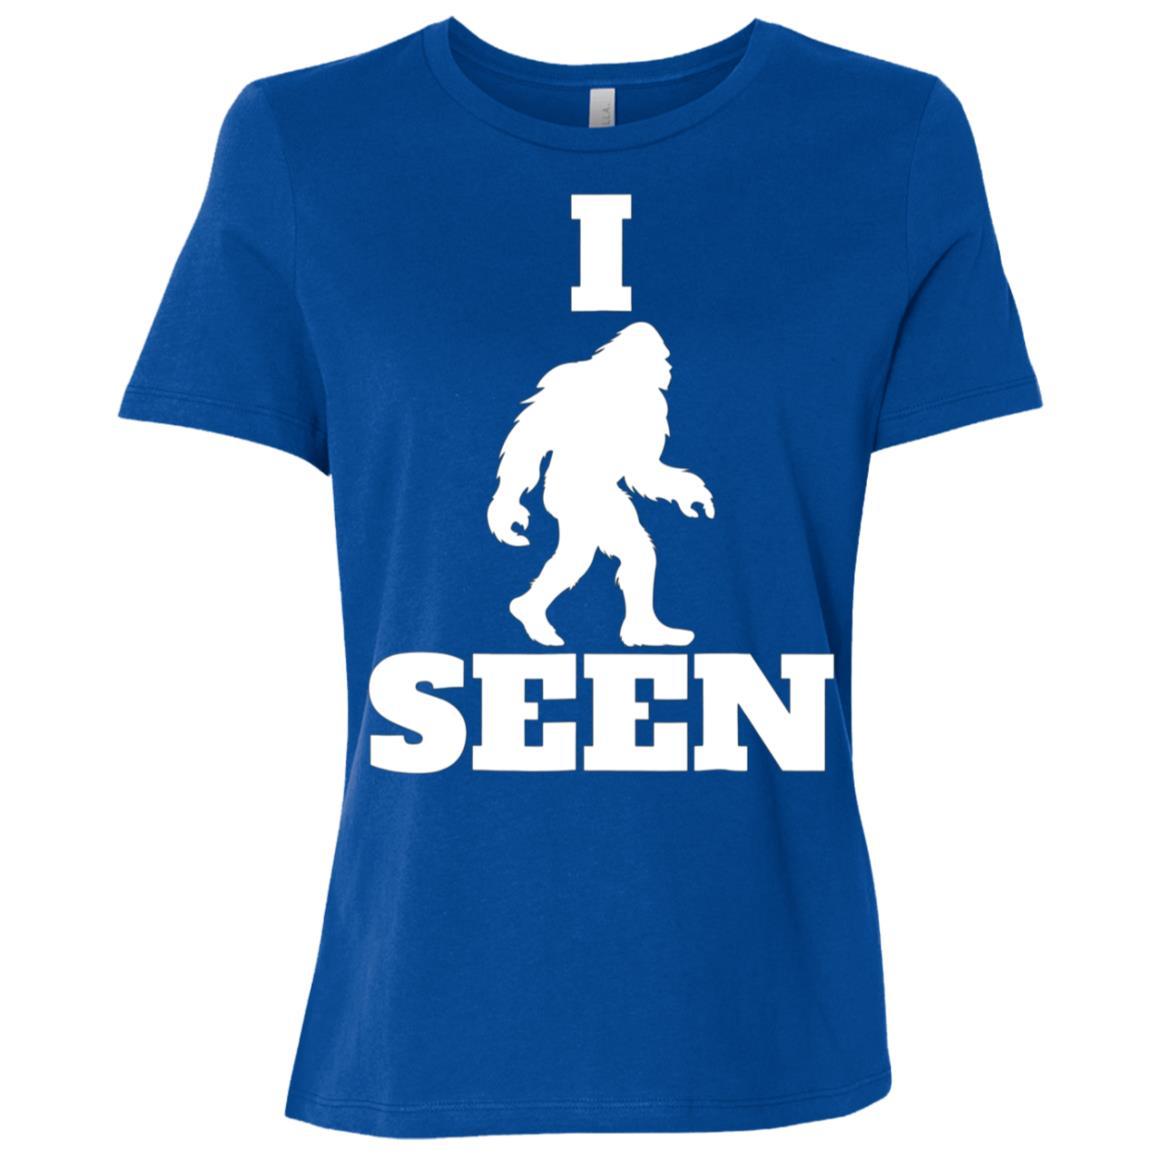 I Seen Bigfoot Bigfoot Believer Sasquatch Yeti Tee-1 Women Short Sleeve T-Shirt